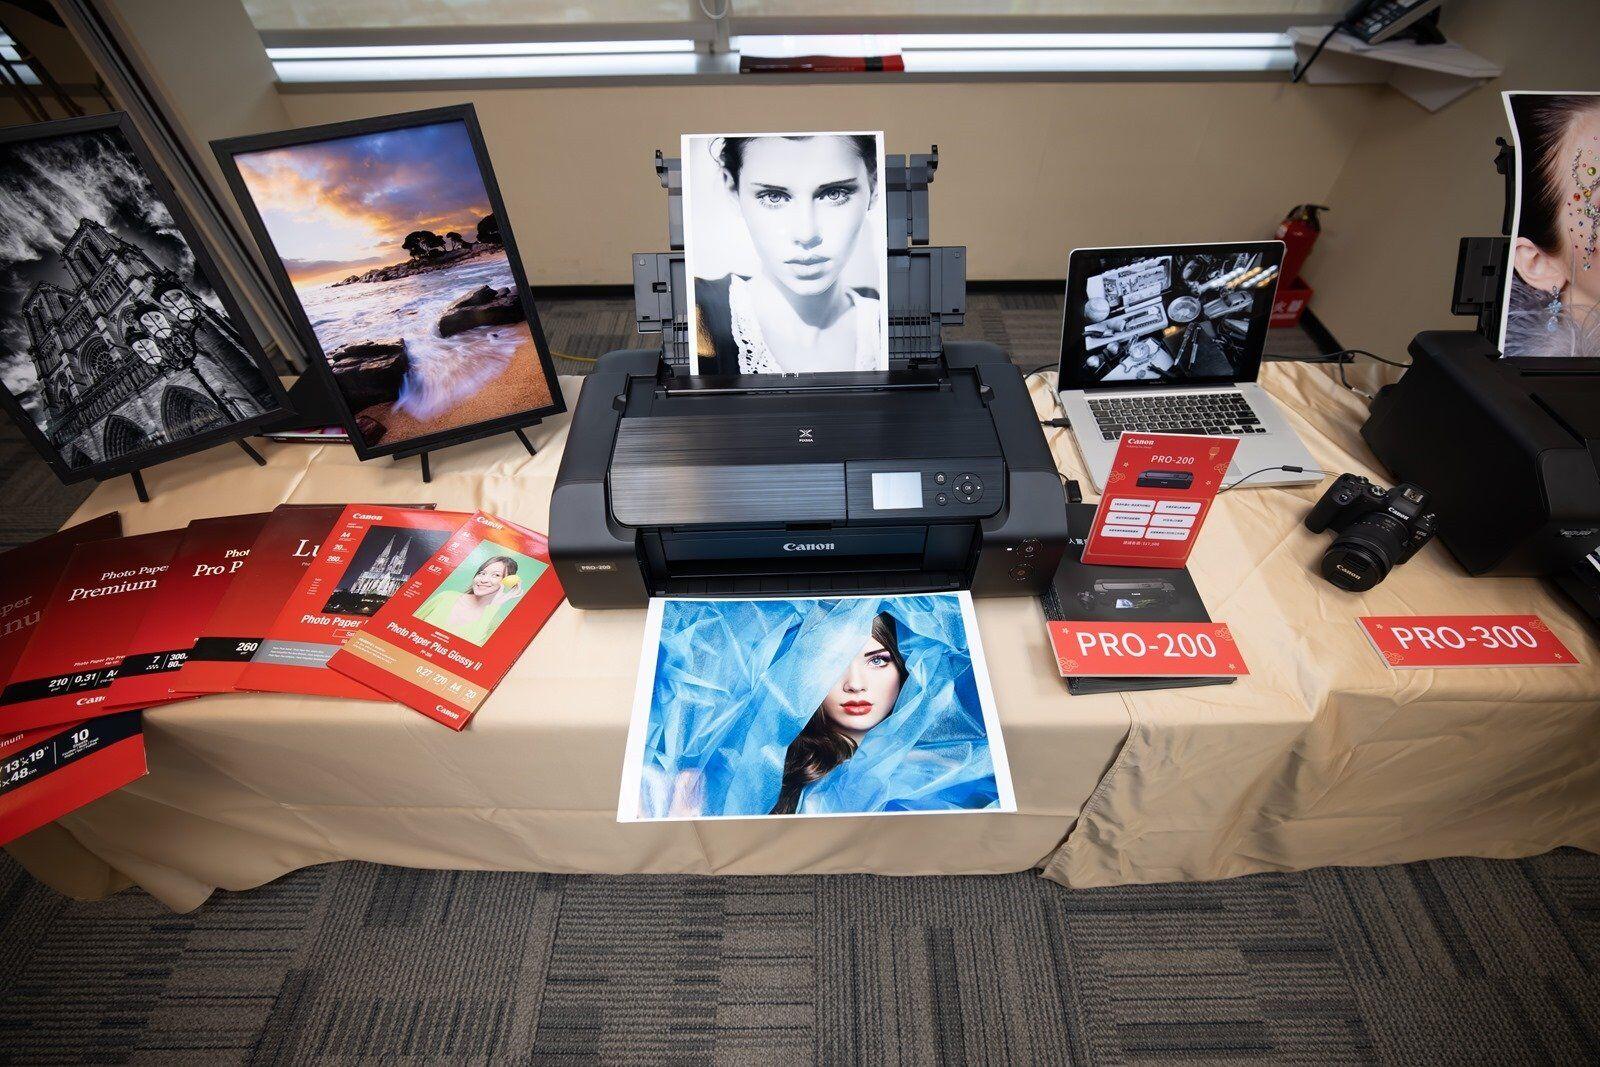 Canon 推出多款噴墨印表機 居家辦公最佳利器 原廠大供墨印表機 G1020/G2020/G3020 超大印量全新升級 多功能相片複合機 E3470 影像輸出神隊友 @3C 達人廖阿輝